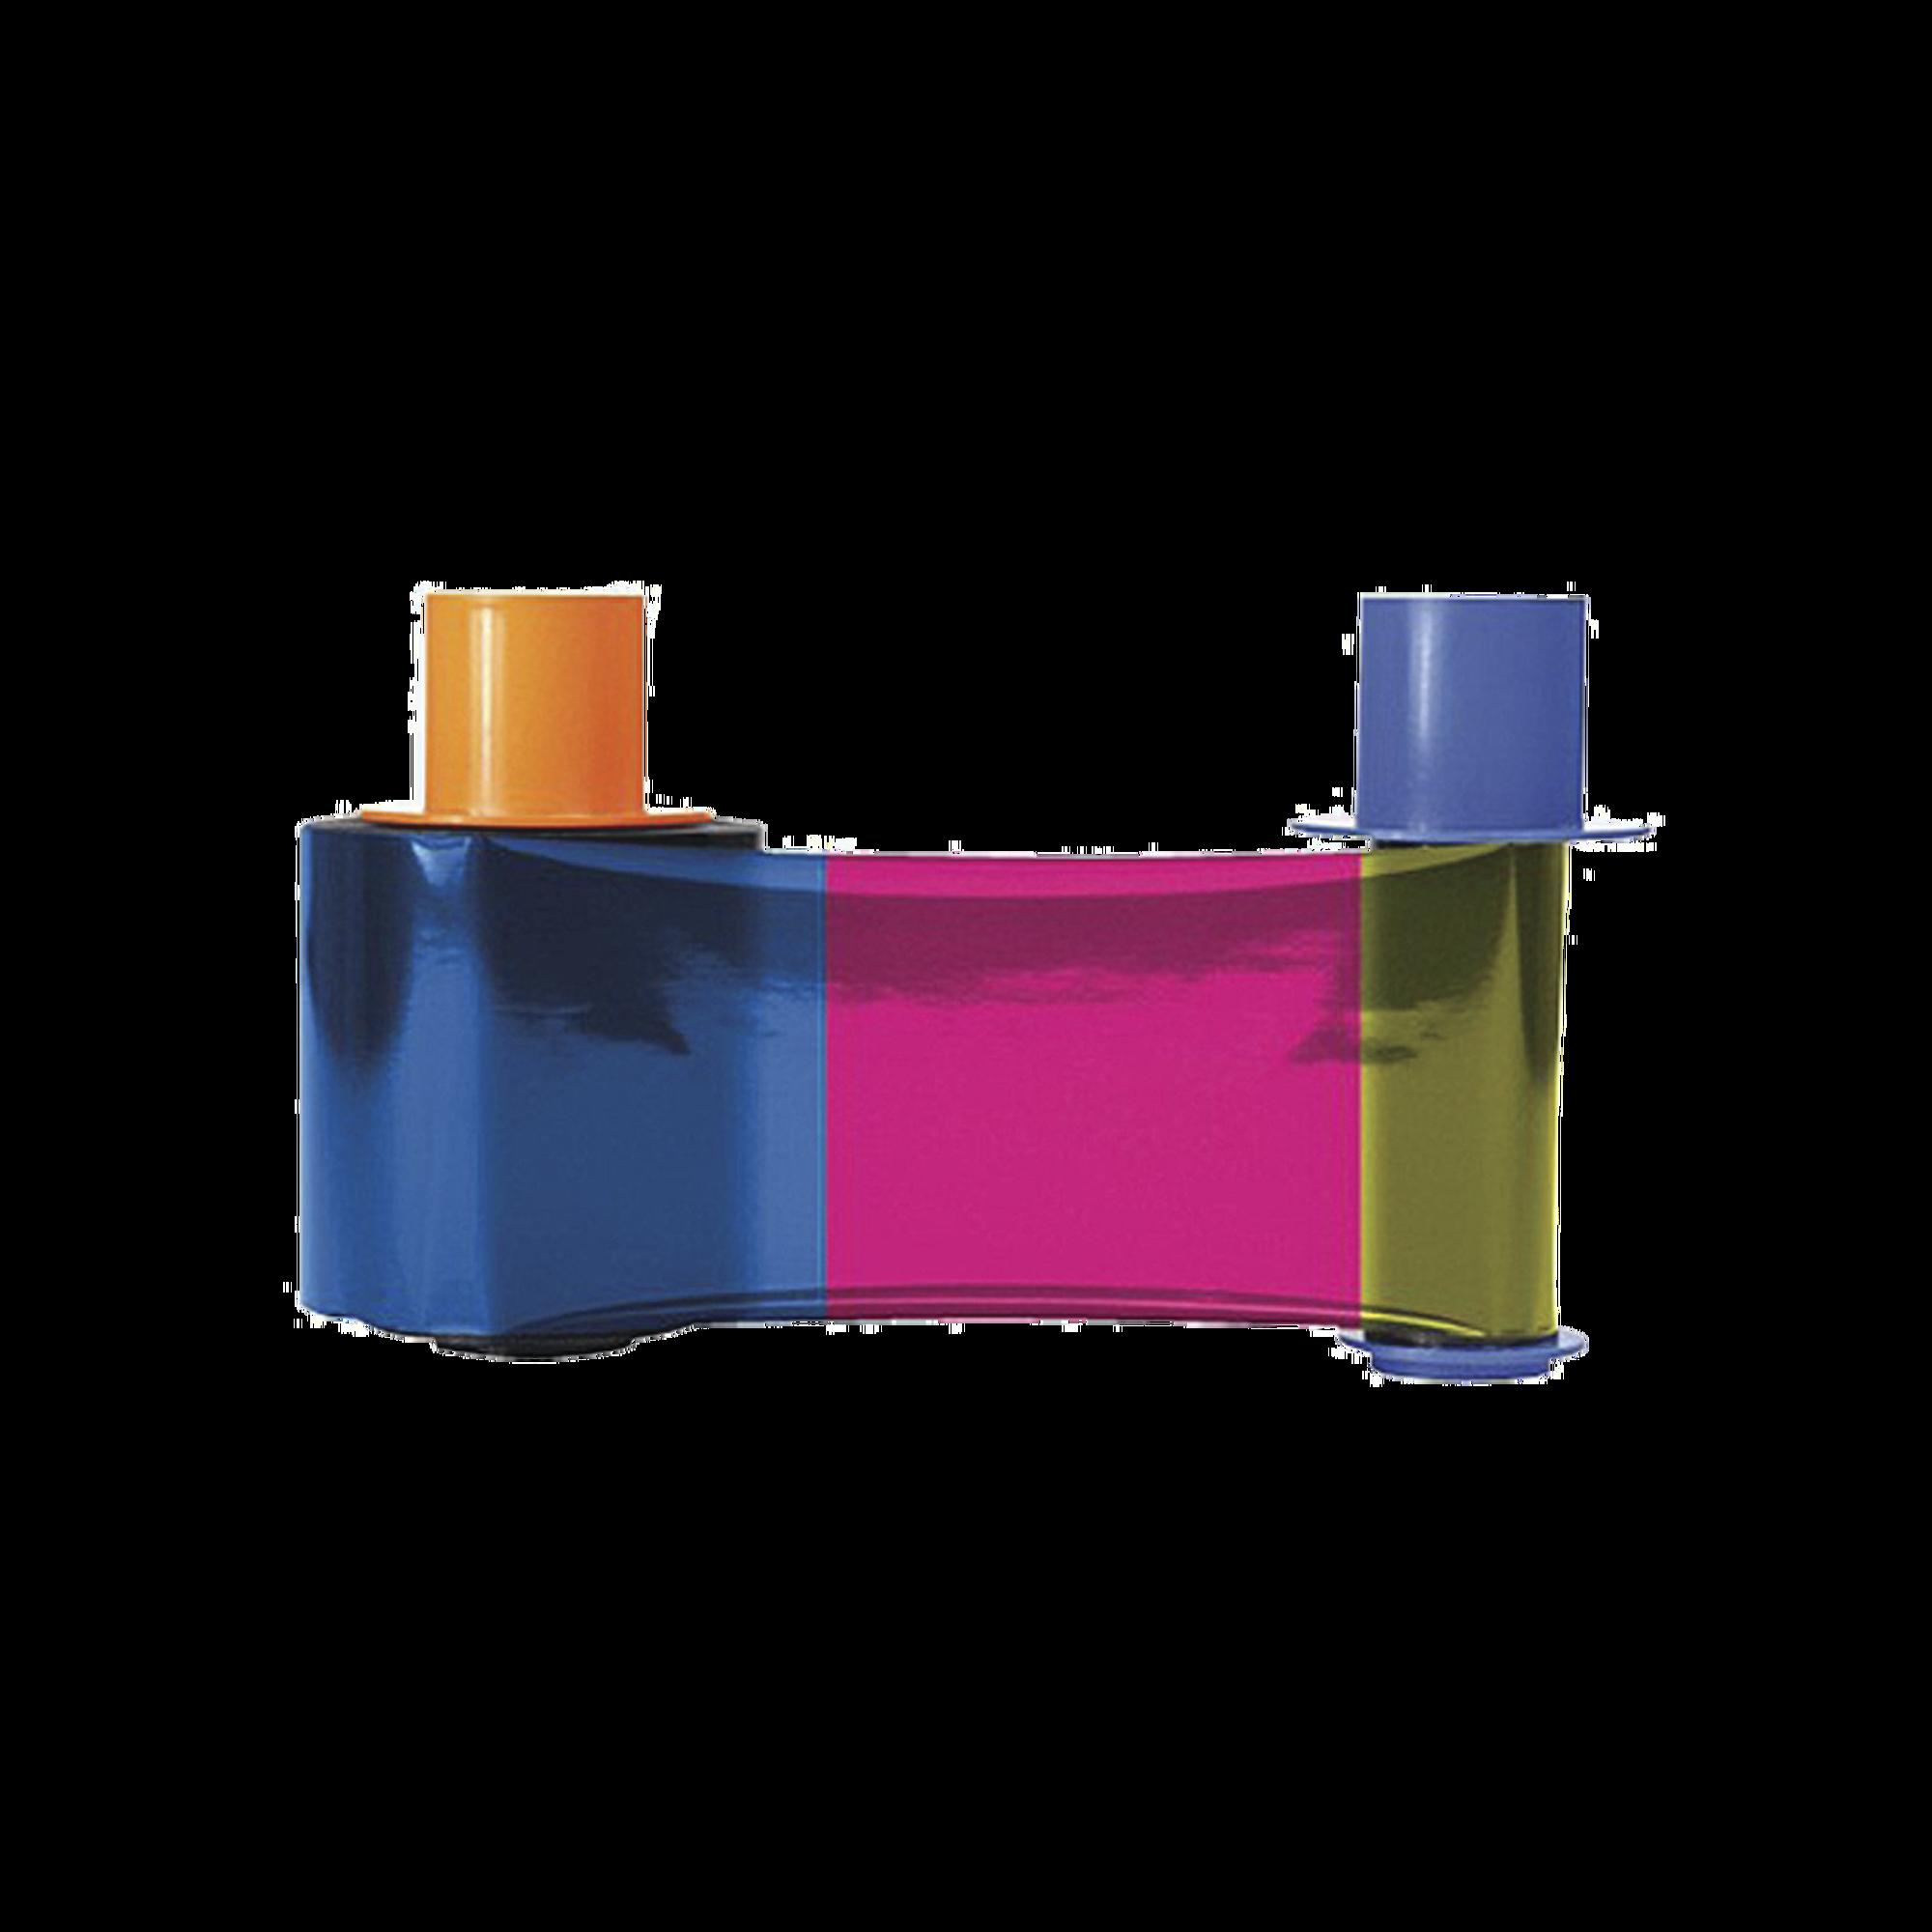 Ribbon YMCKO para DTC1500 / 500 impresiones